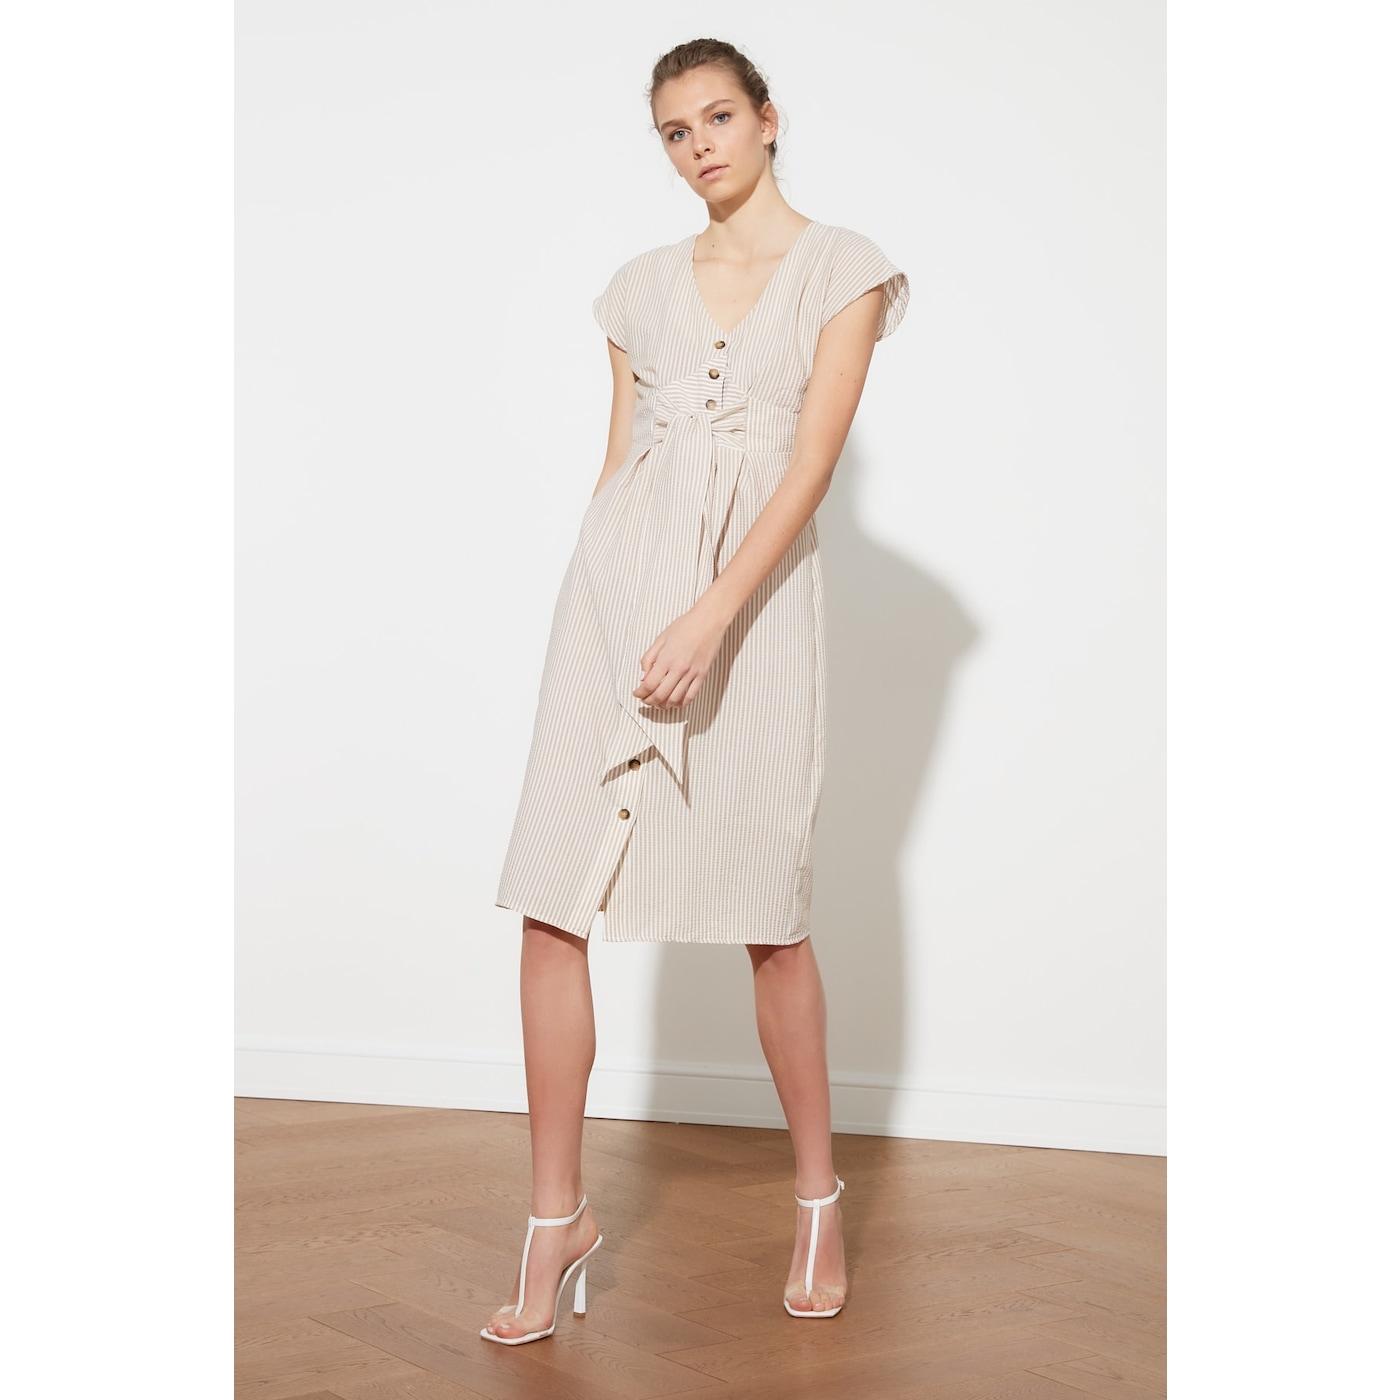 Trendyol Striped Dress with White Tie DetailING dámské 36